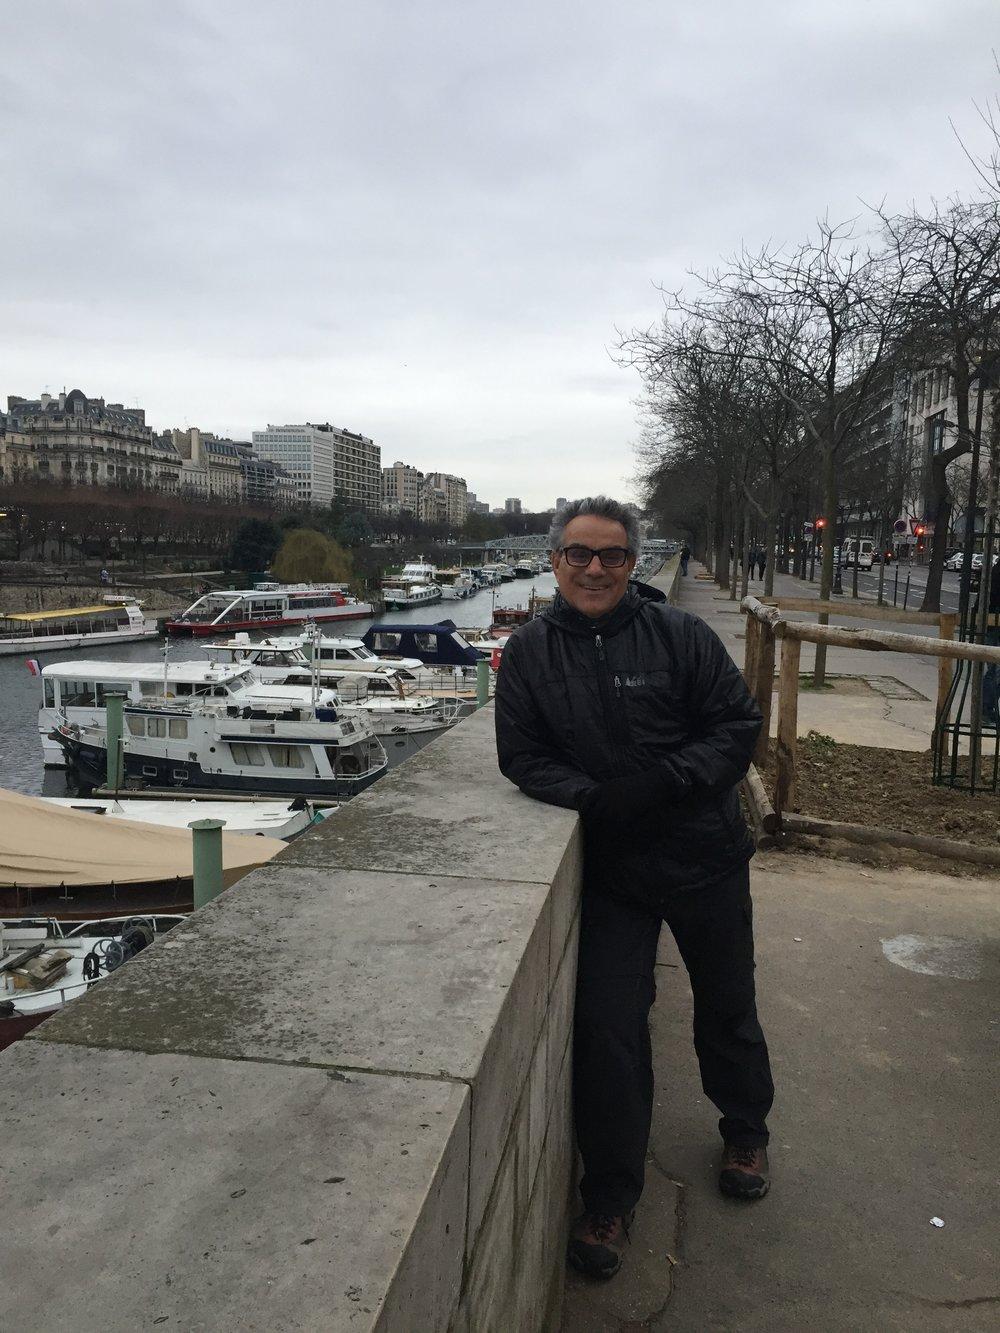 Frank at the Seine